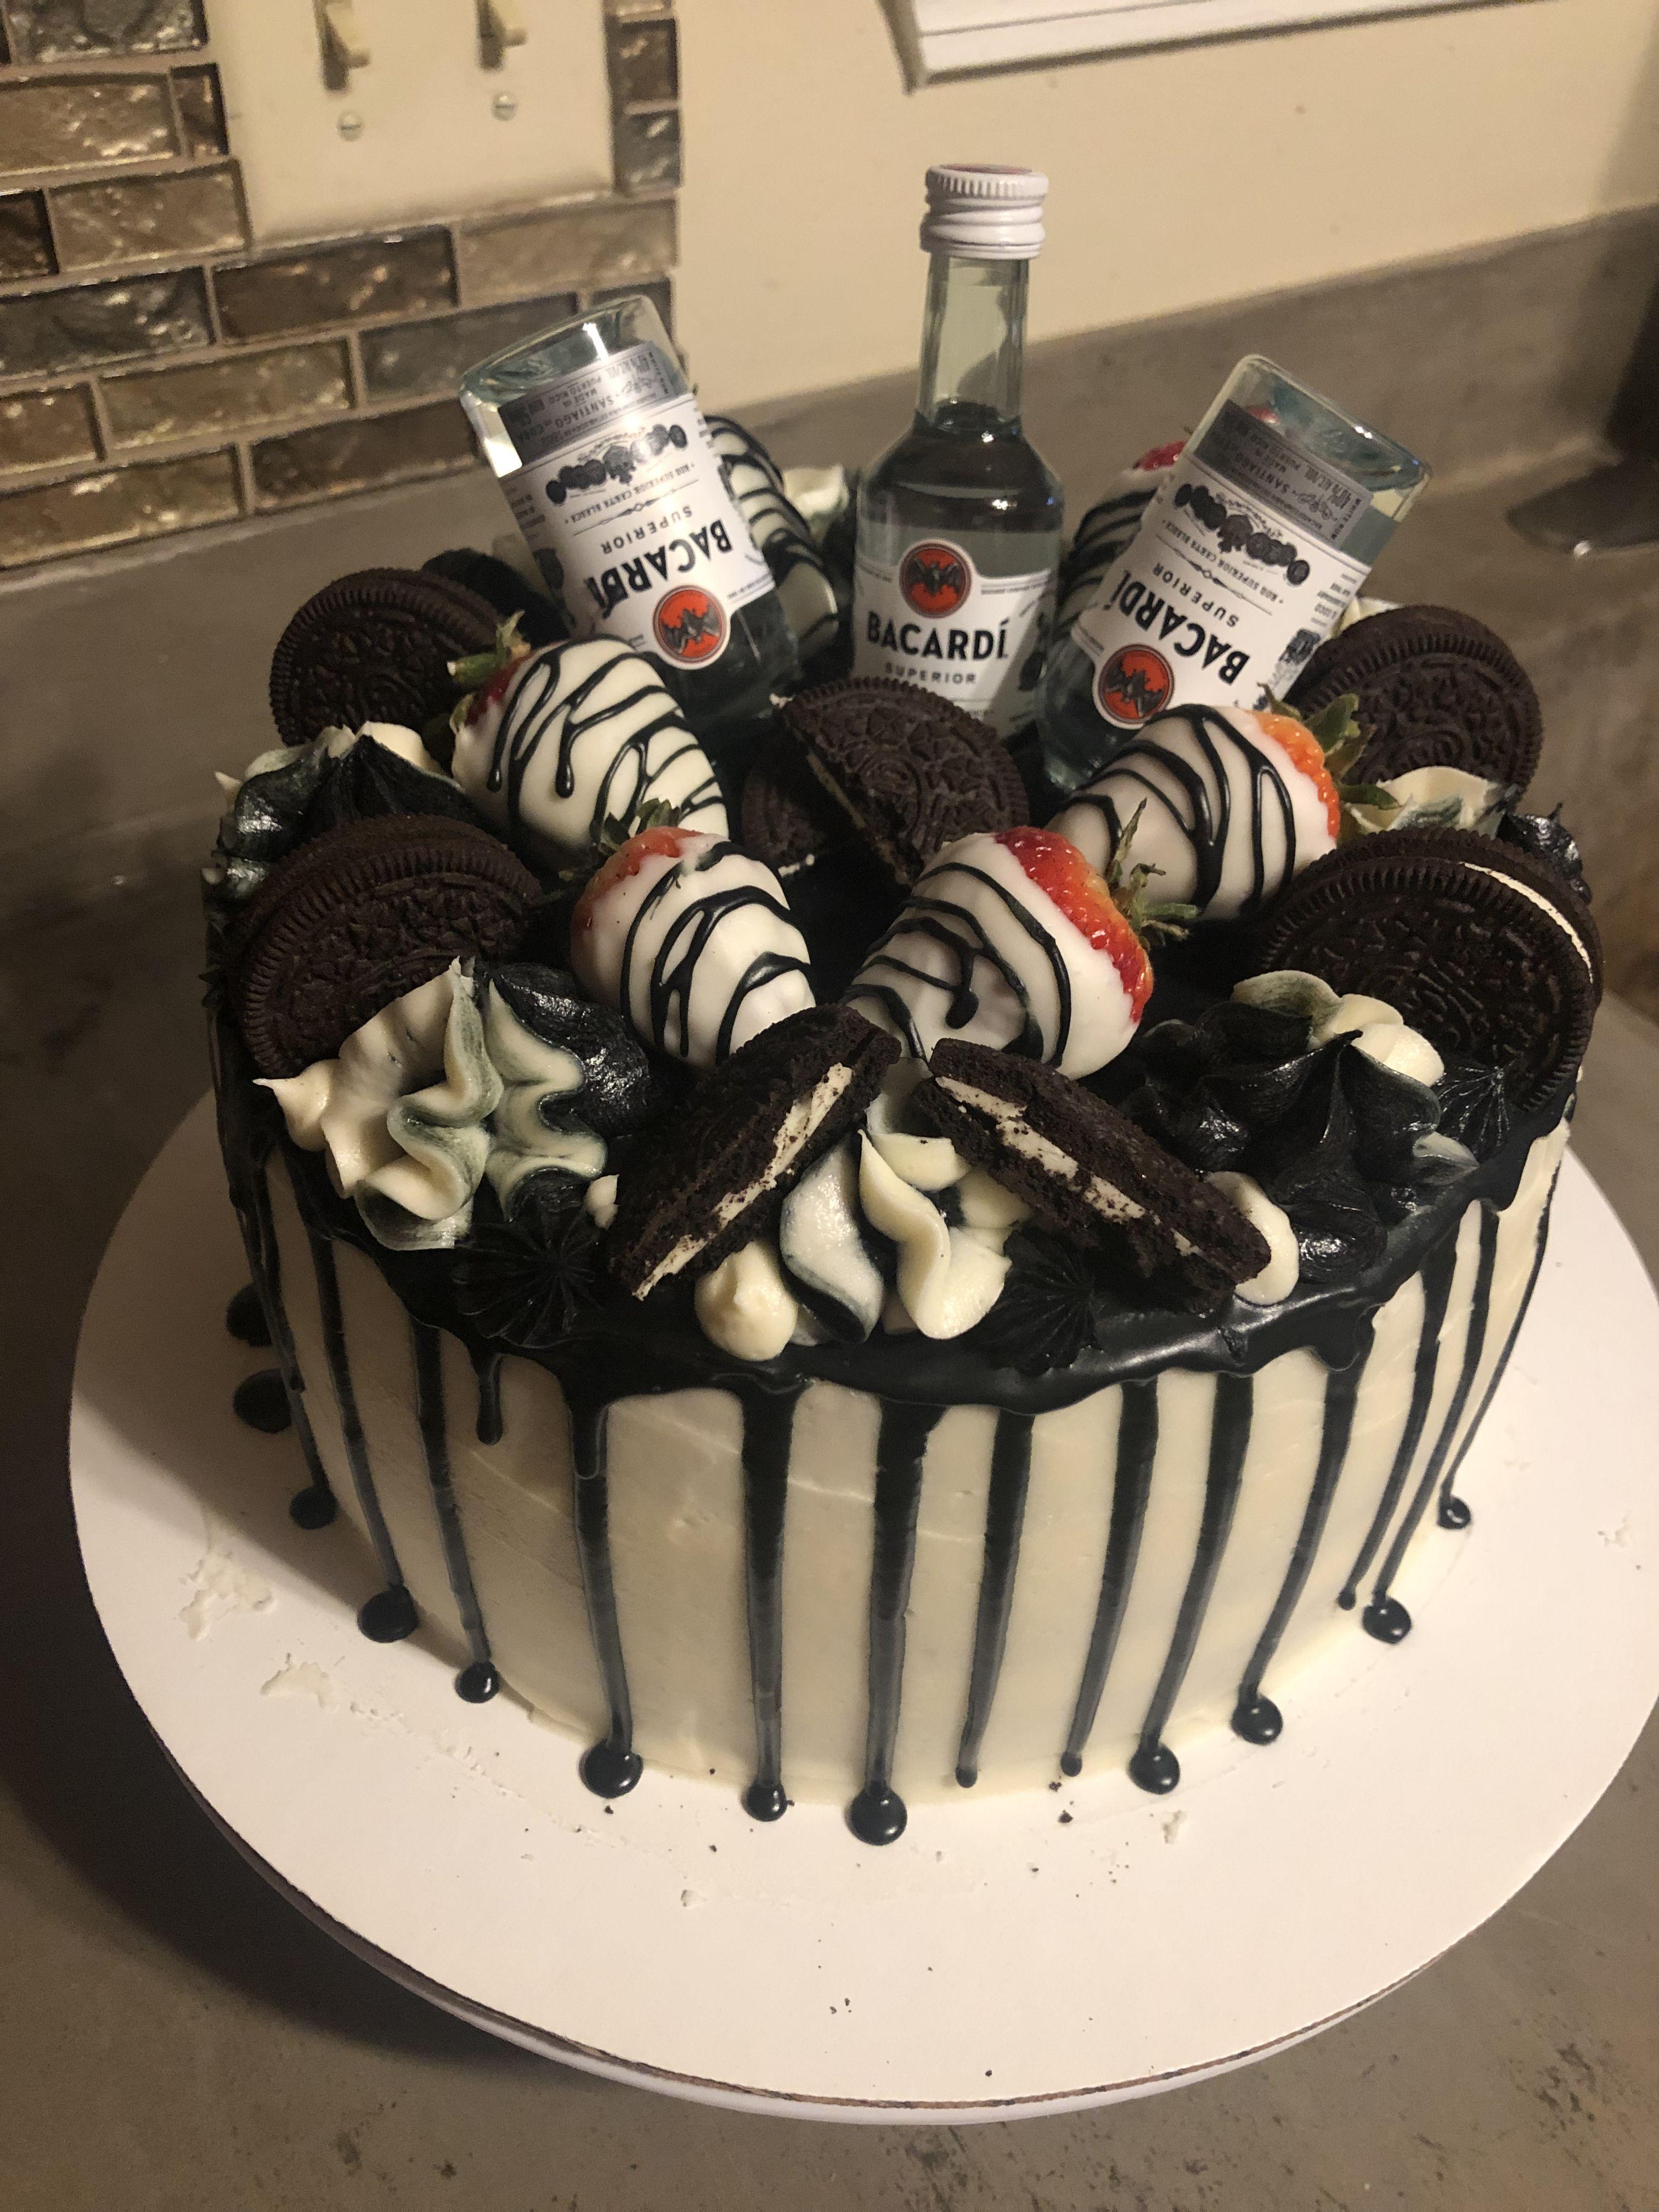 Oreo Strawberry Liquor Bottle Drip Cake Liquor Cake Drip Cakes Cake